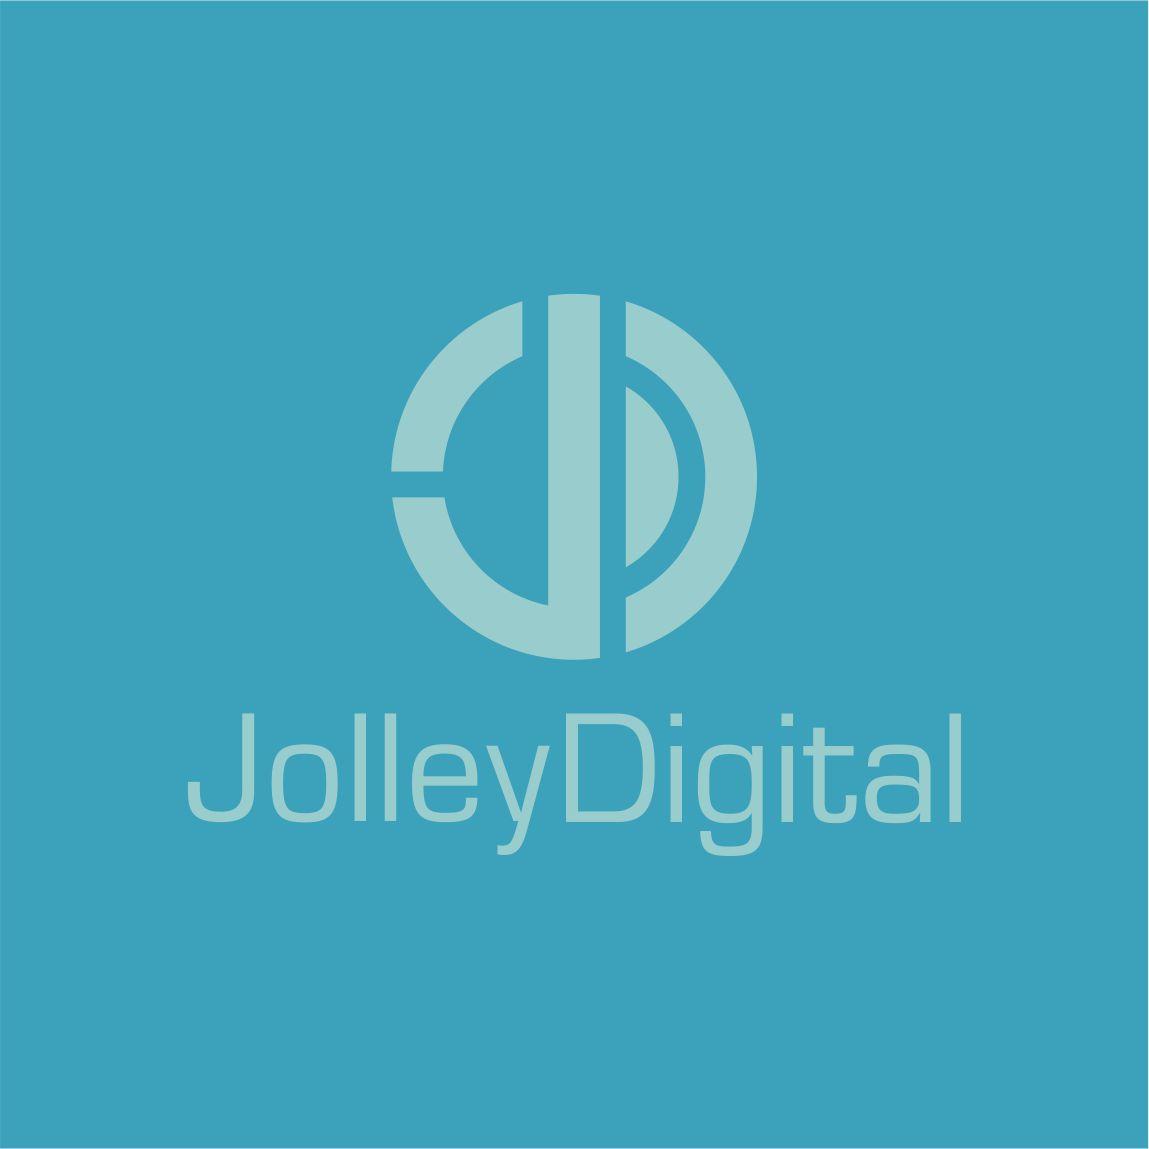 Design a fun logo for my web development agency